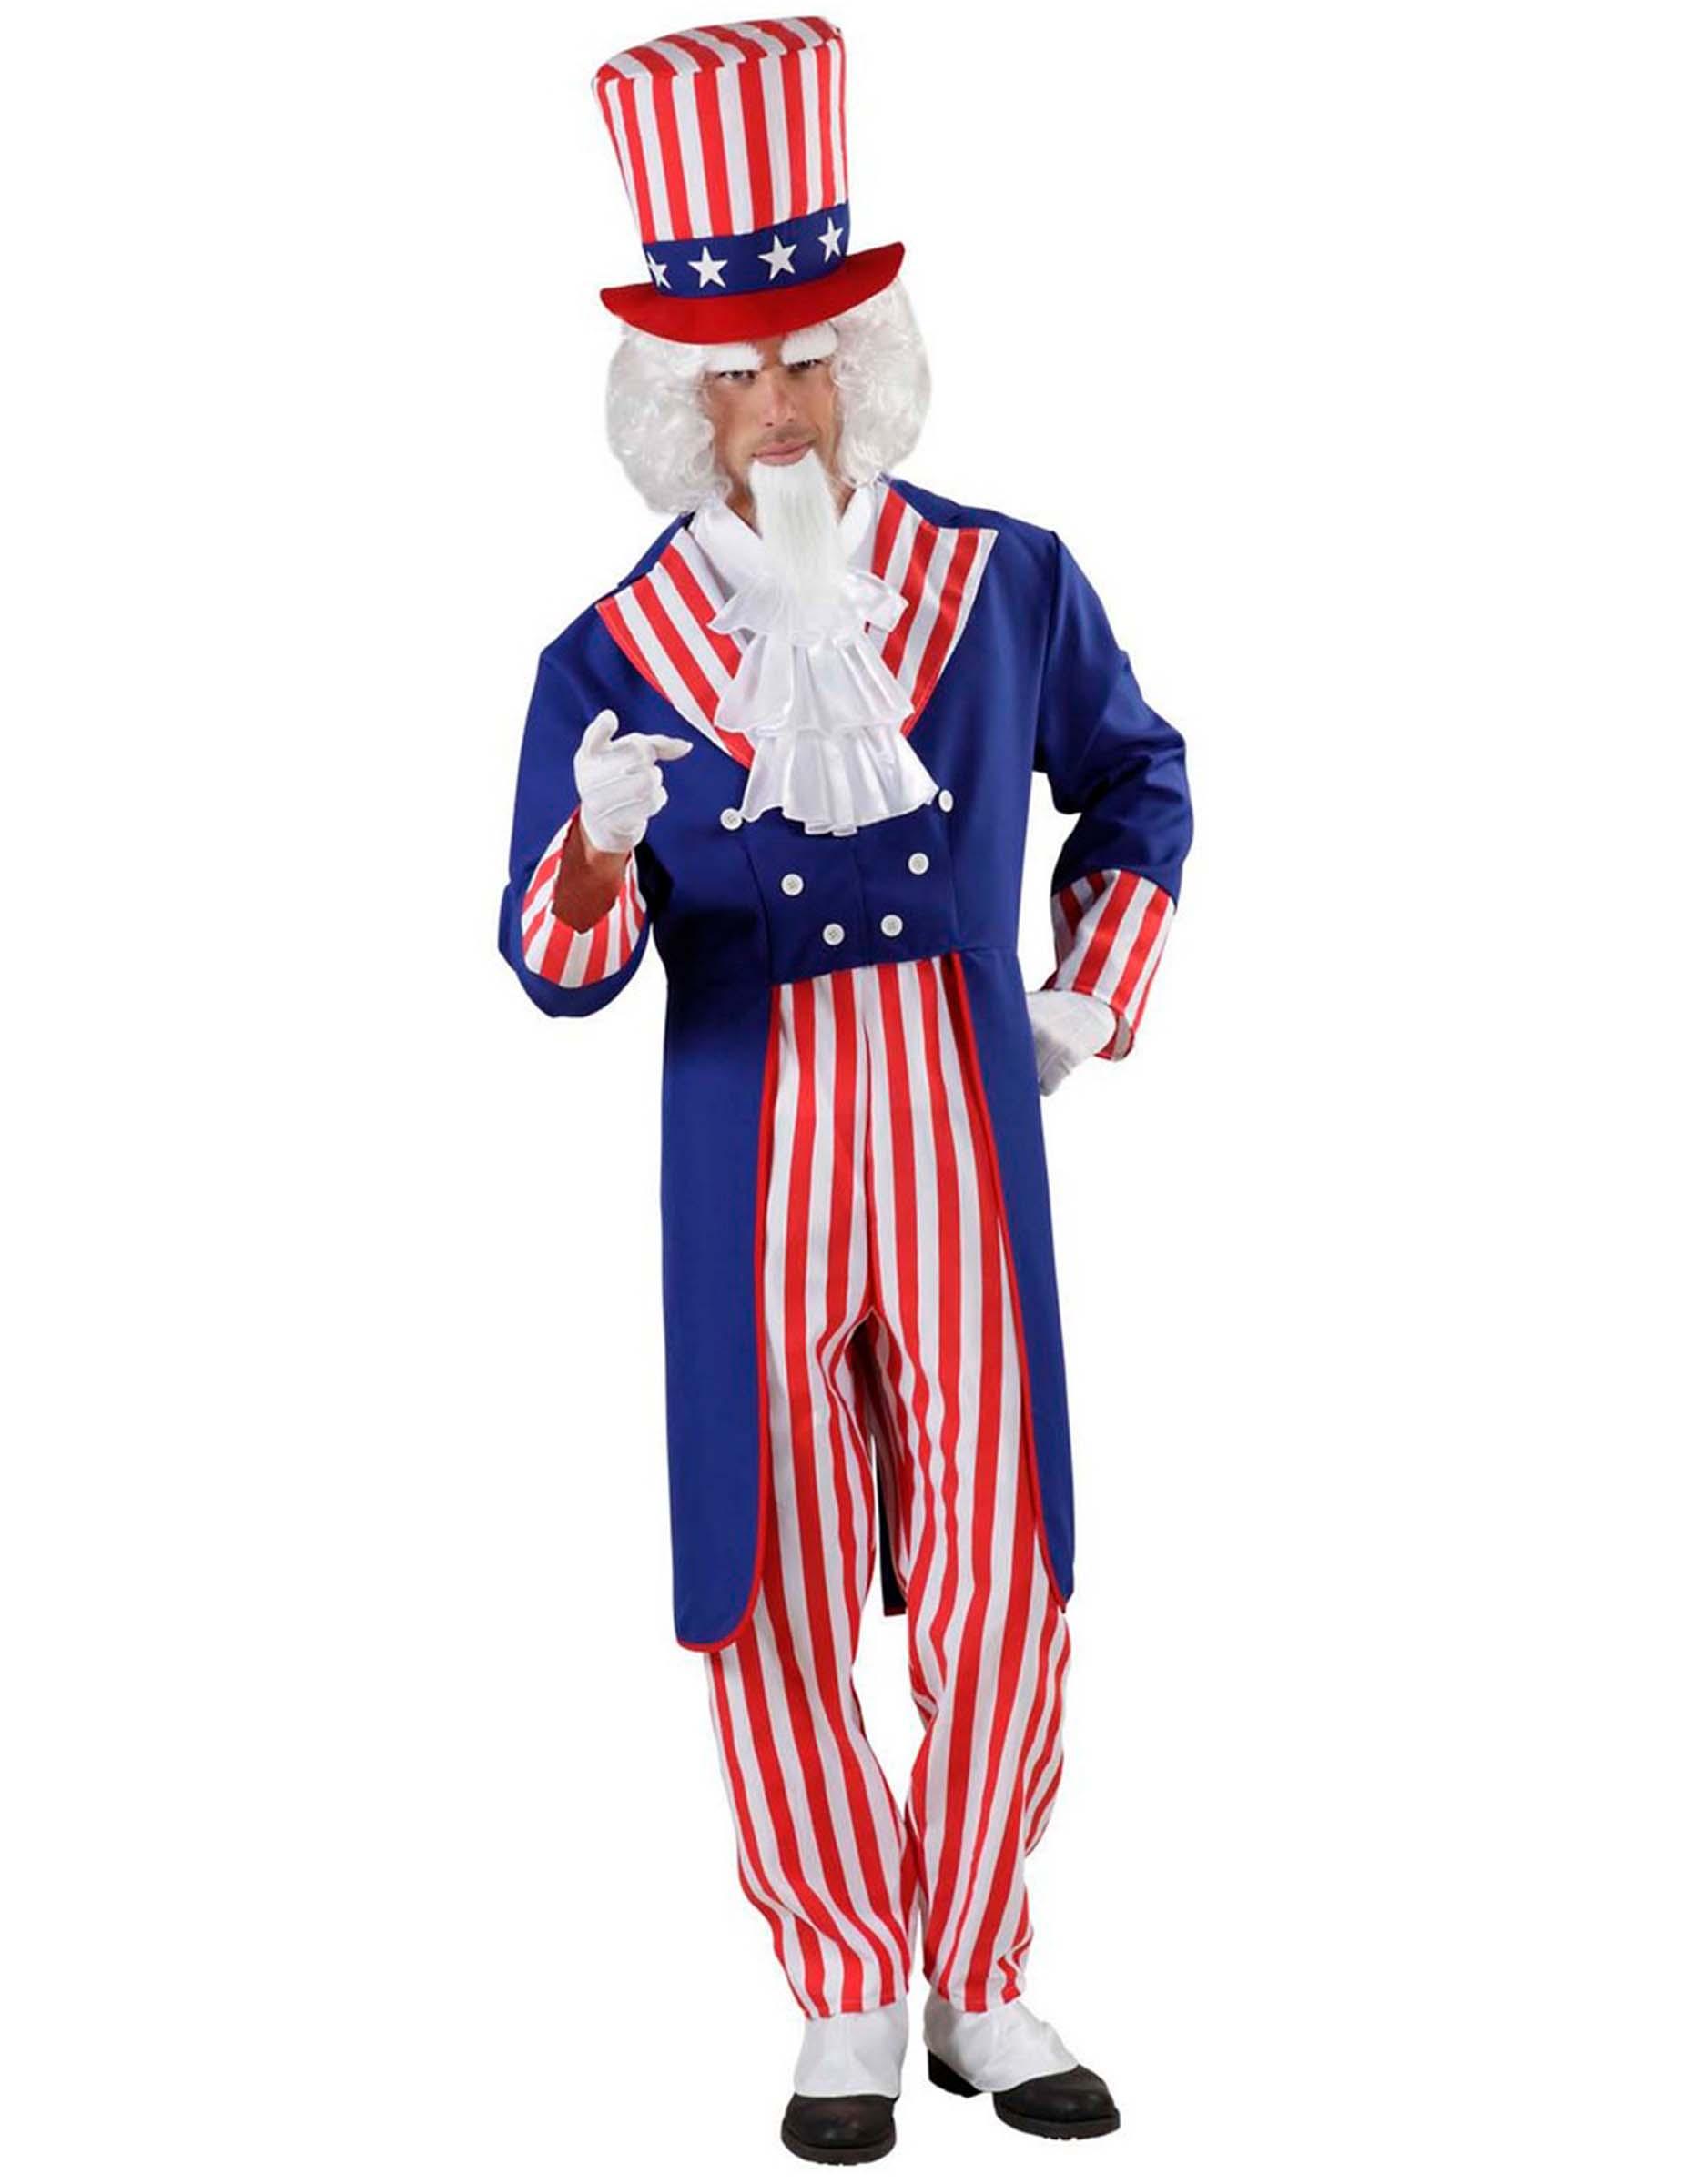 D guisement oncle sam adulte deguise toi achat de d guisements adultes - Theme de deguisement ...